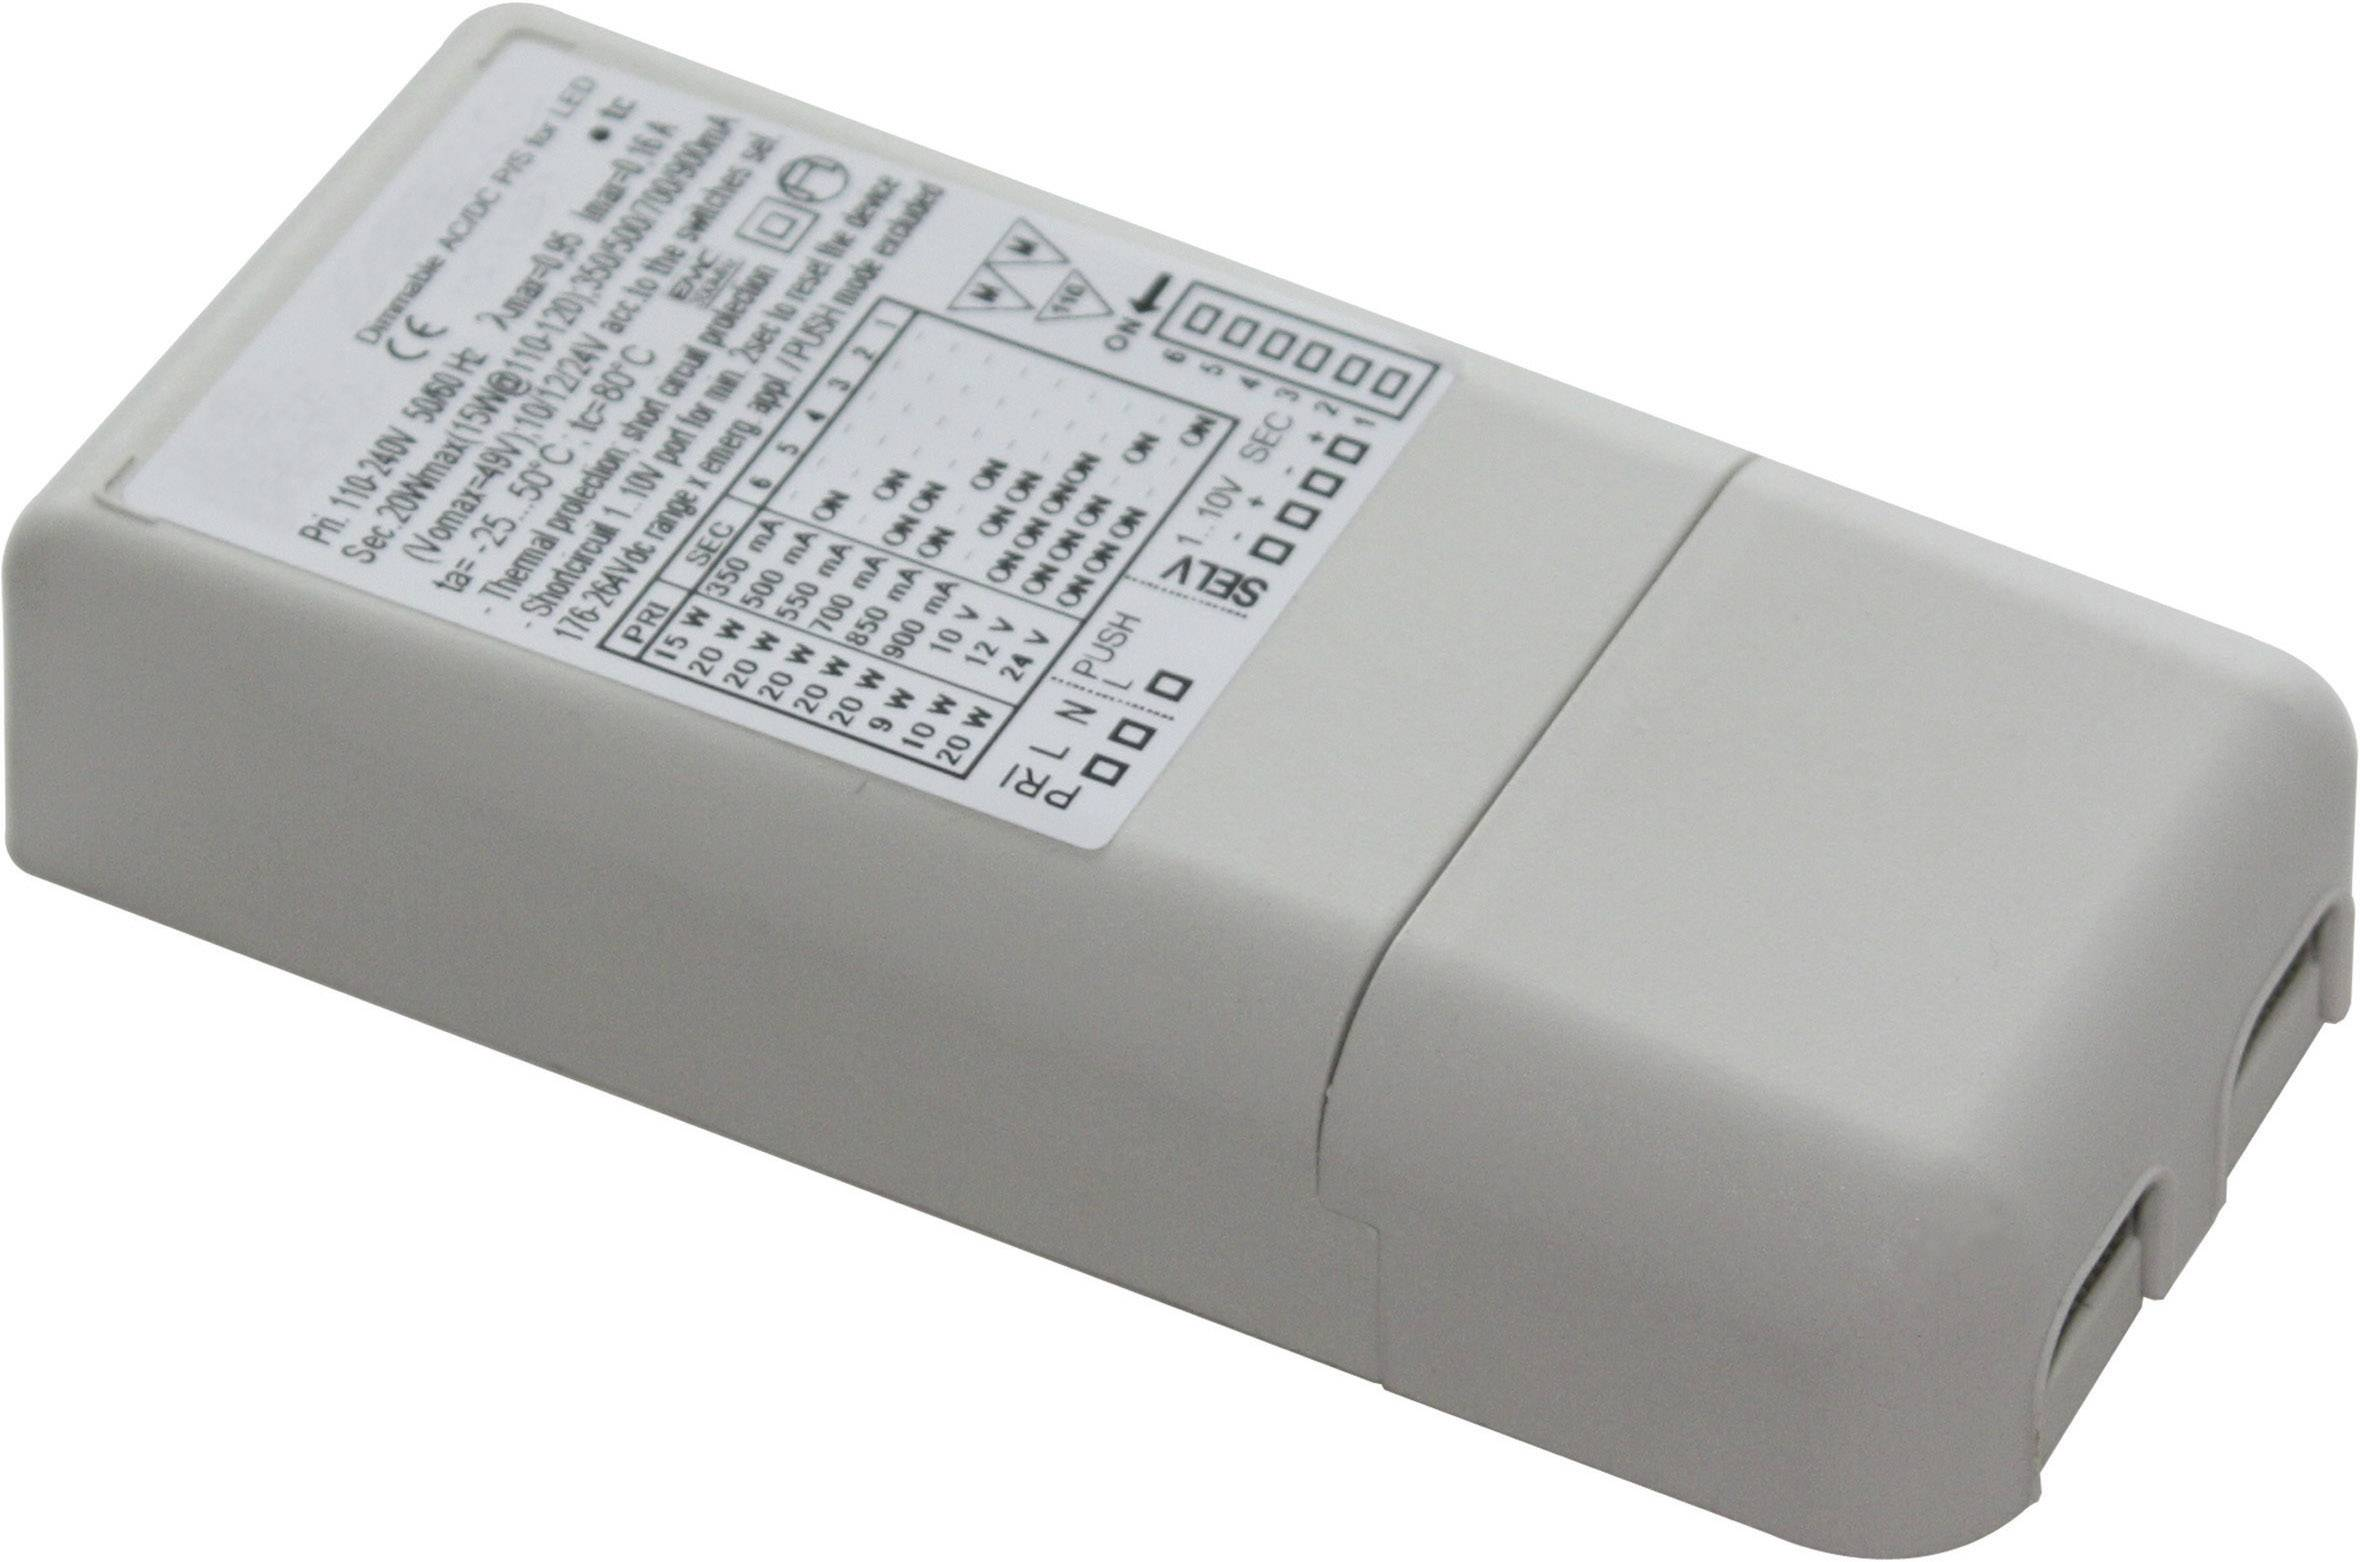 LED konvertor Universal 20W, 350-900 mA, 100-264 V/AC, 176-264 V/DC